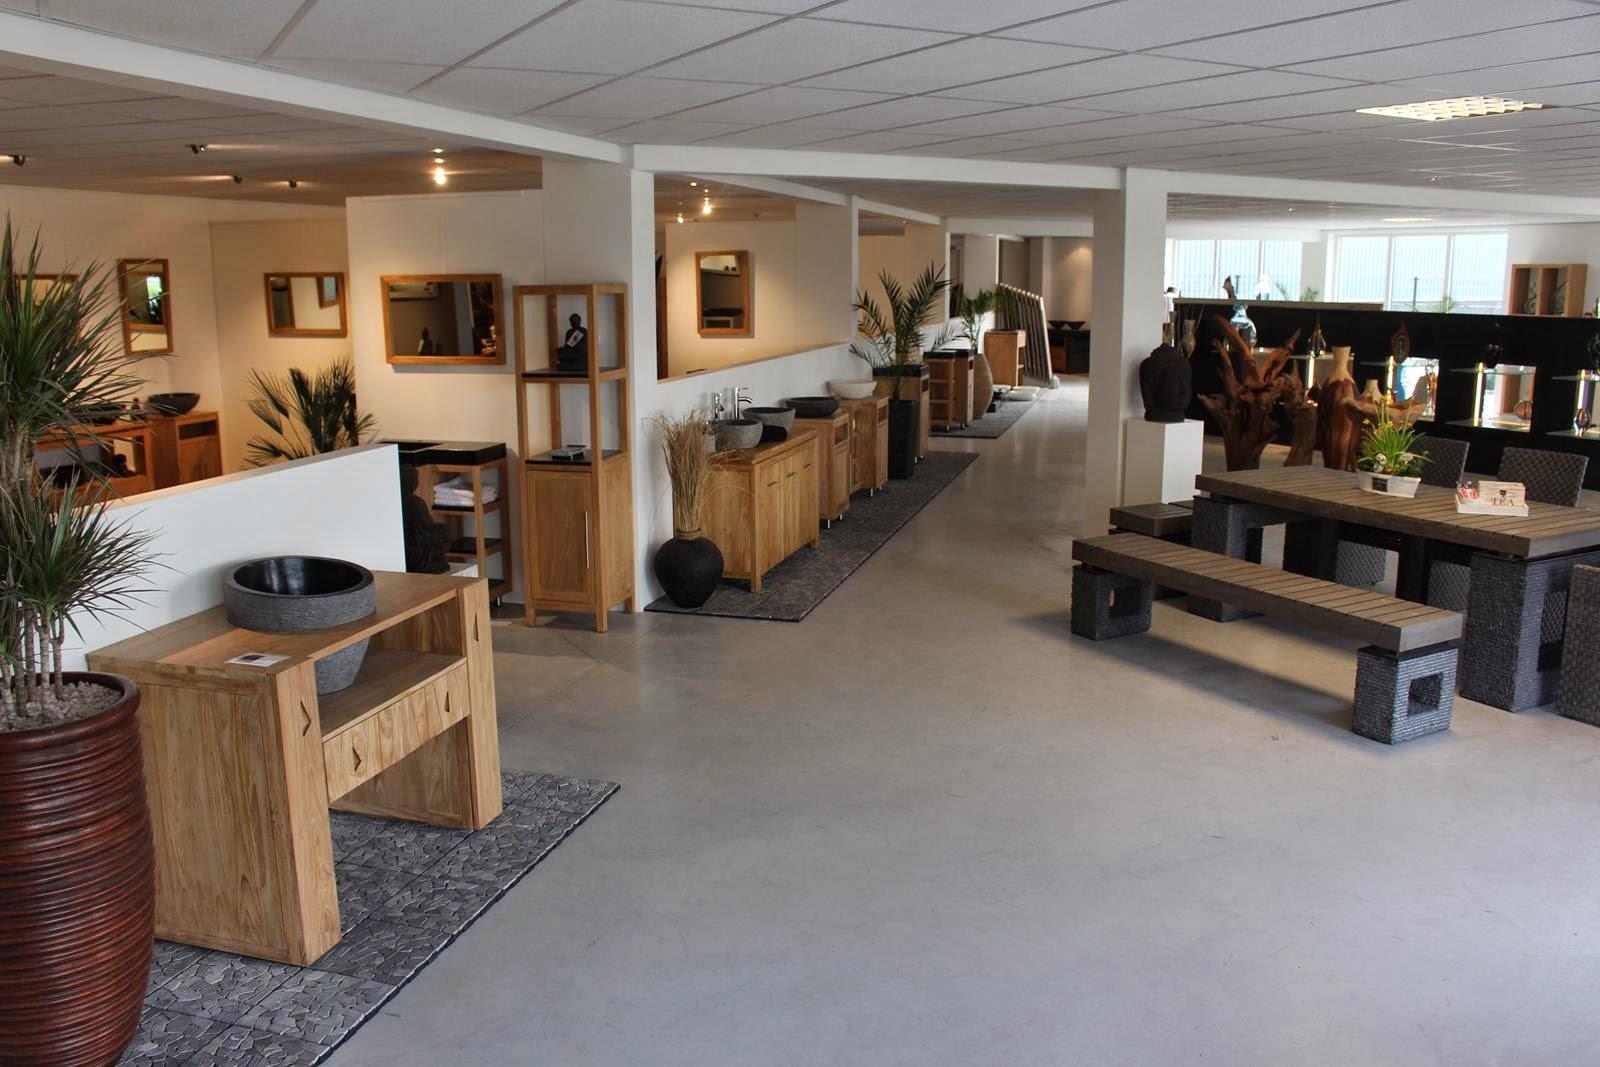 Showroom Badkamermeubels, Wasbakken, Waskommen en Mozaïektegels ...